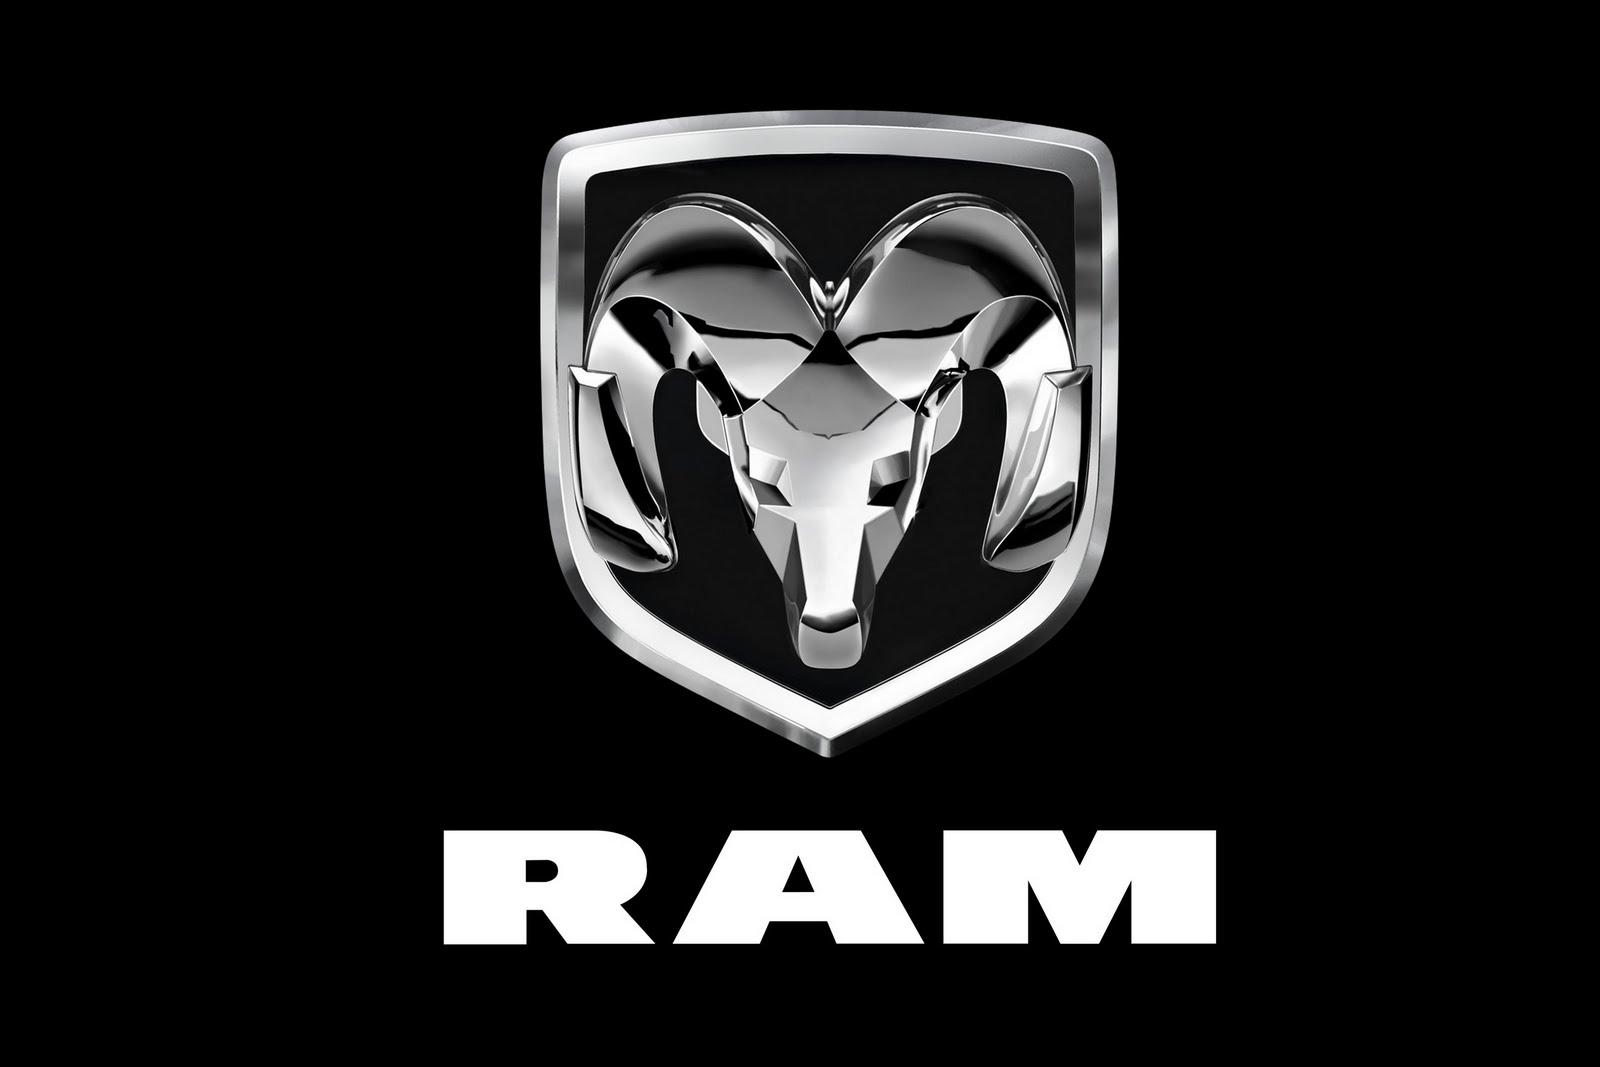 Dodge Ram Logo Wallpaper 5152 Hd Wallpapers in Logos   Imagescicom 1600x1067